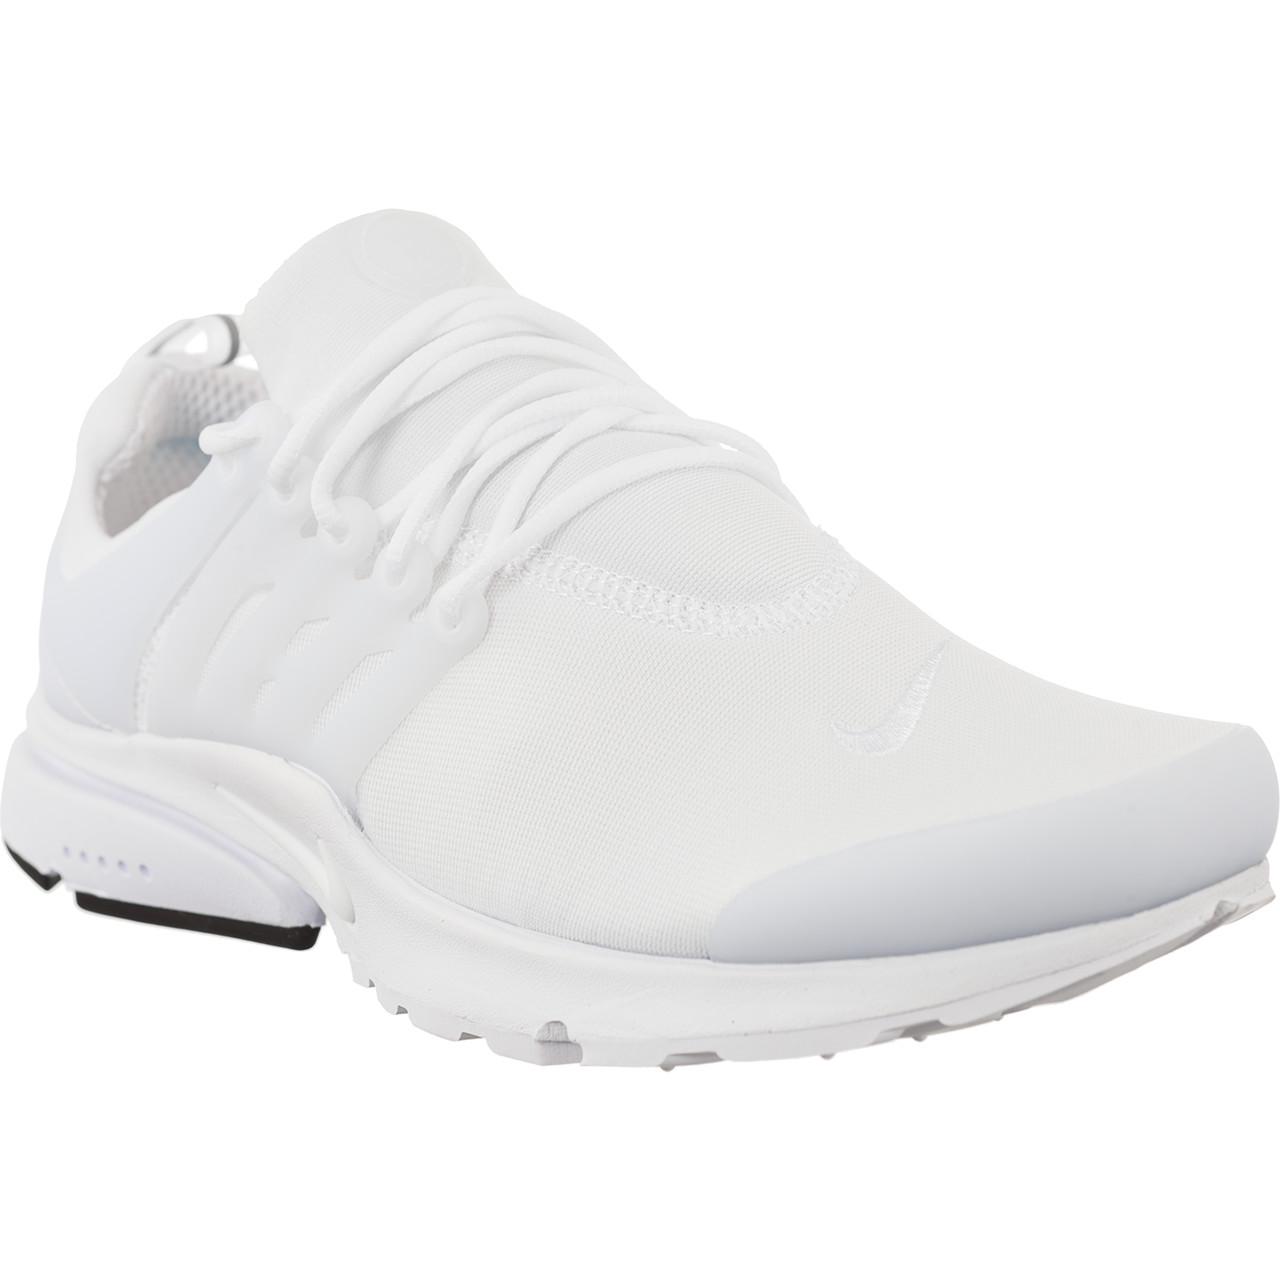 new concept ebac3 0eec5 Buty Nike brsmallAir Presto Essential ...